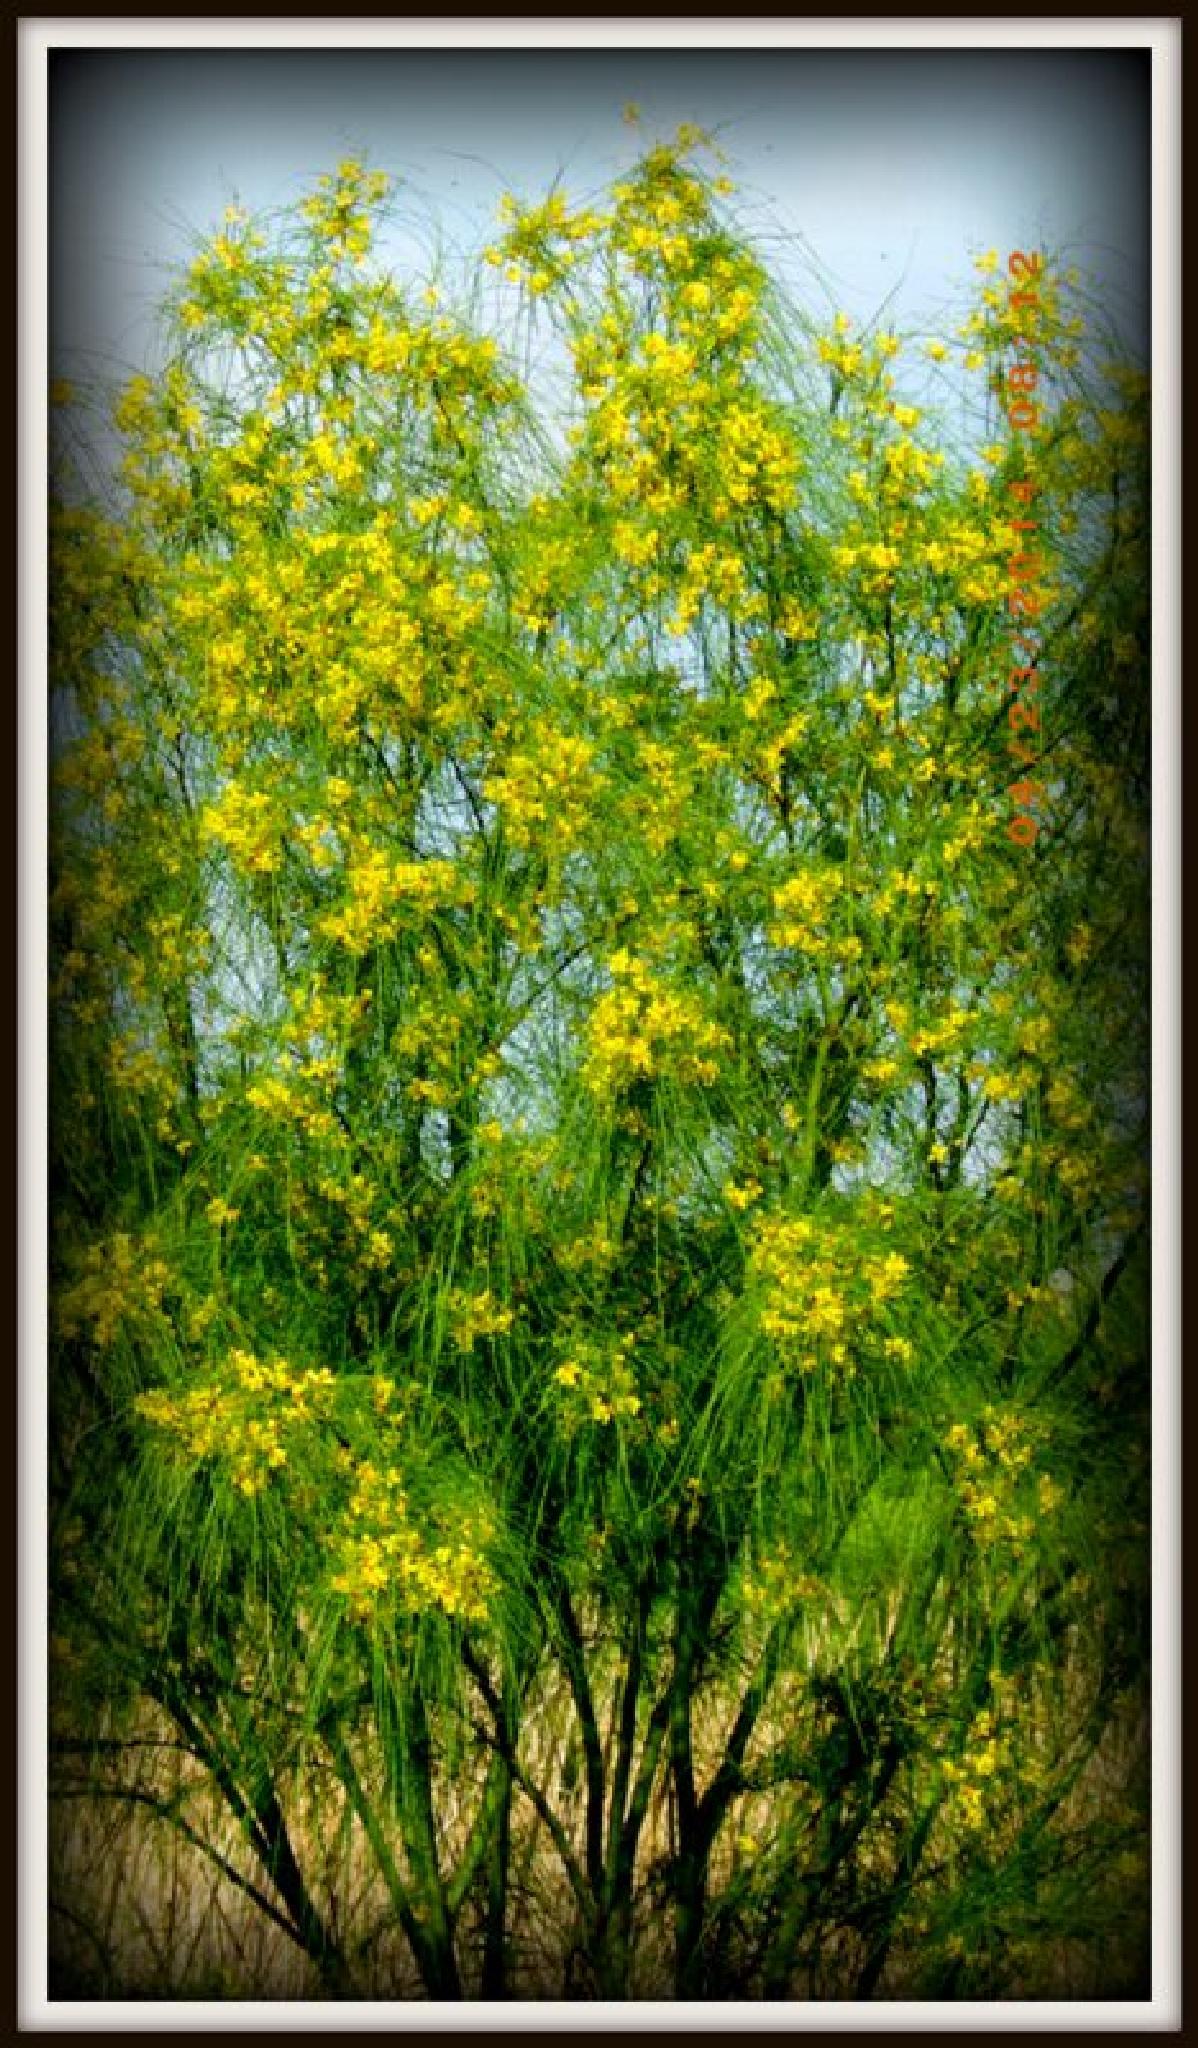 April showers bring spring Flowers by BVierke